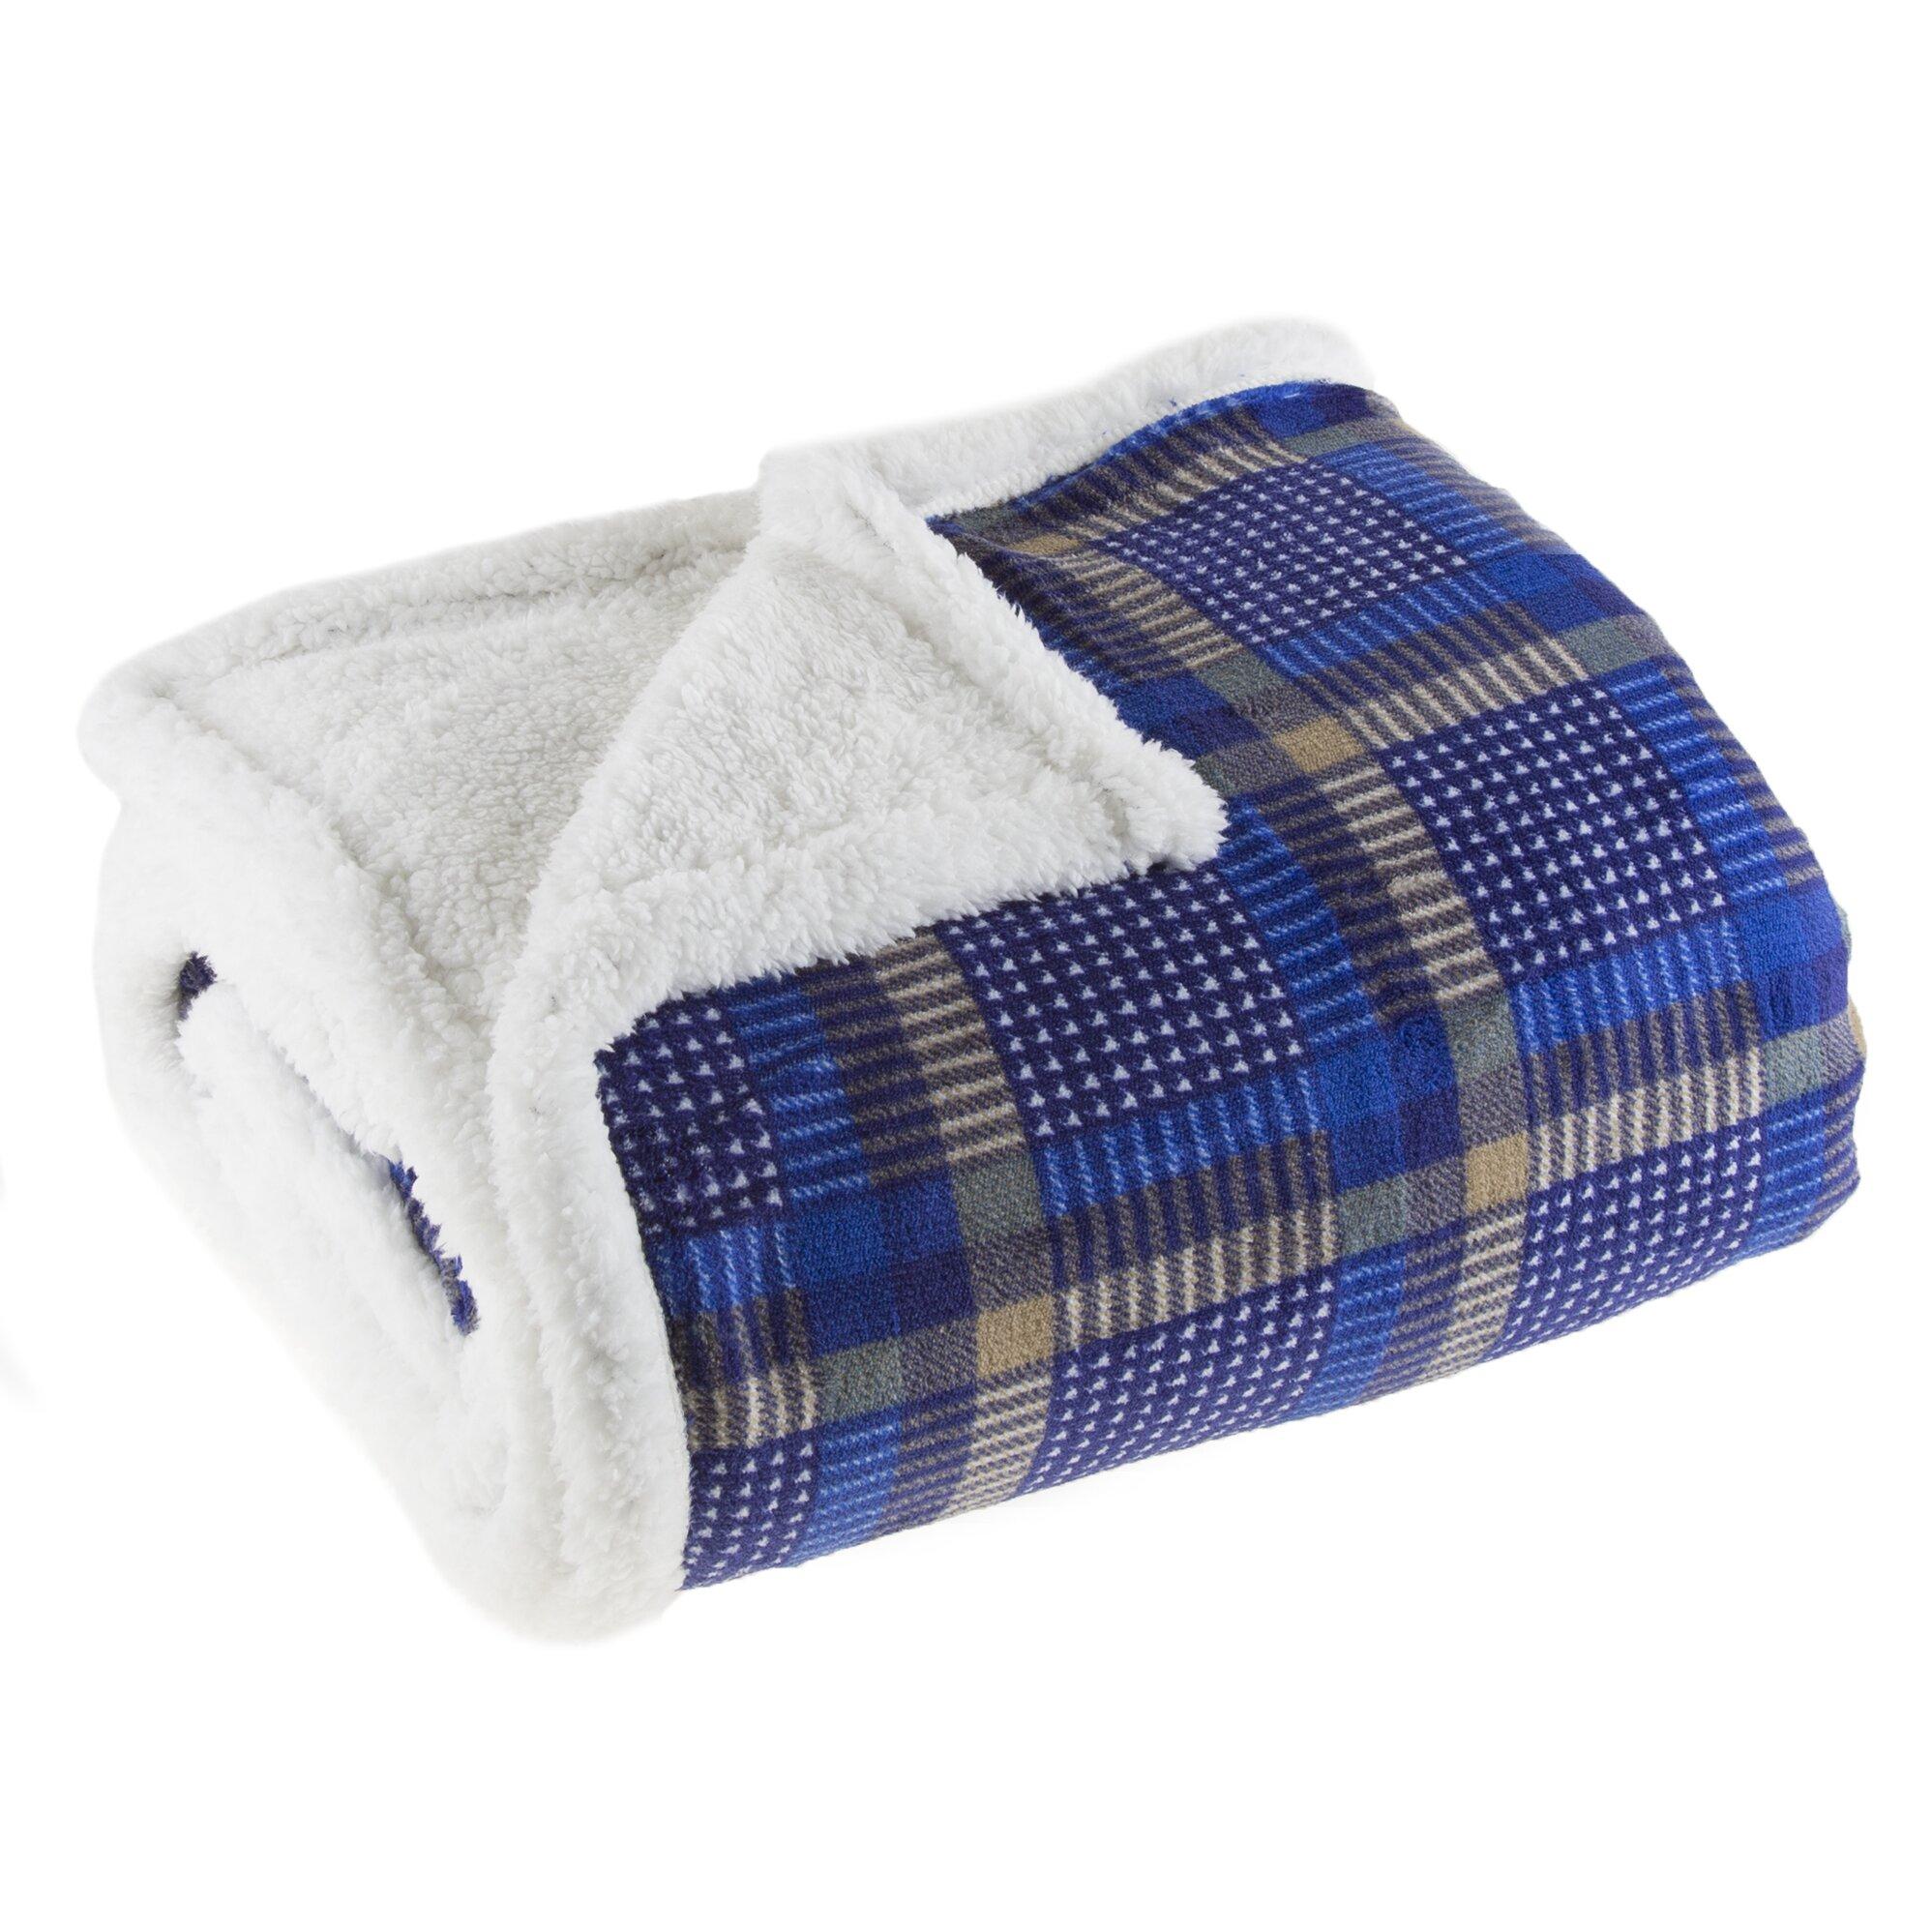 Lavish Home Plaid Sherpa Fleece Throw Blanket Reviews